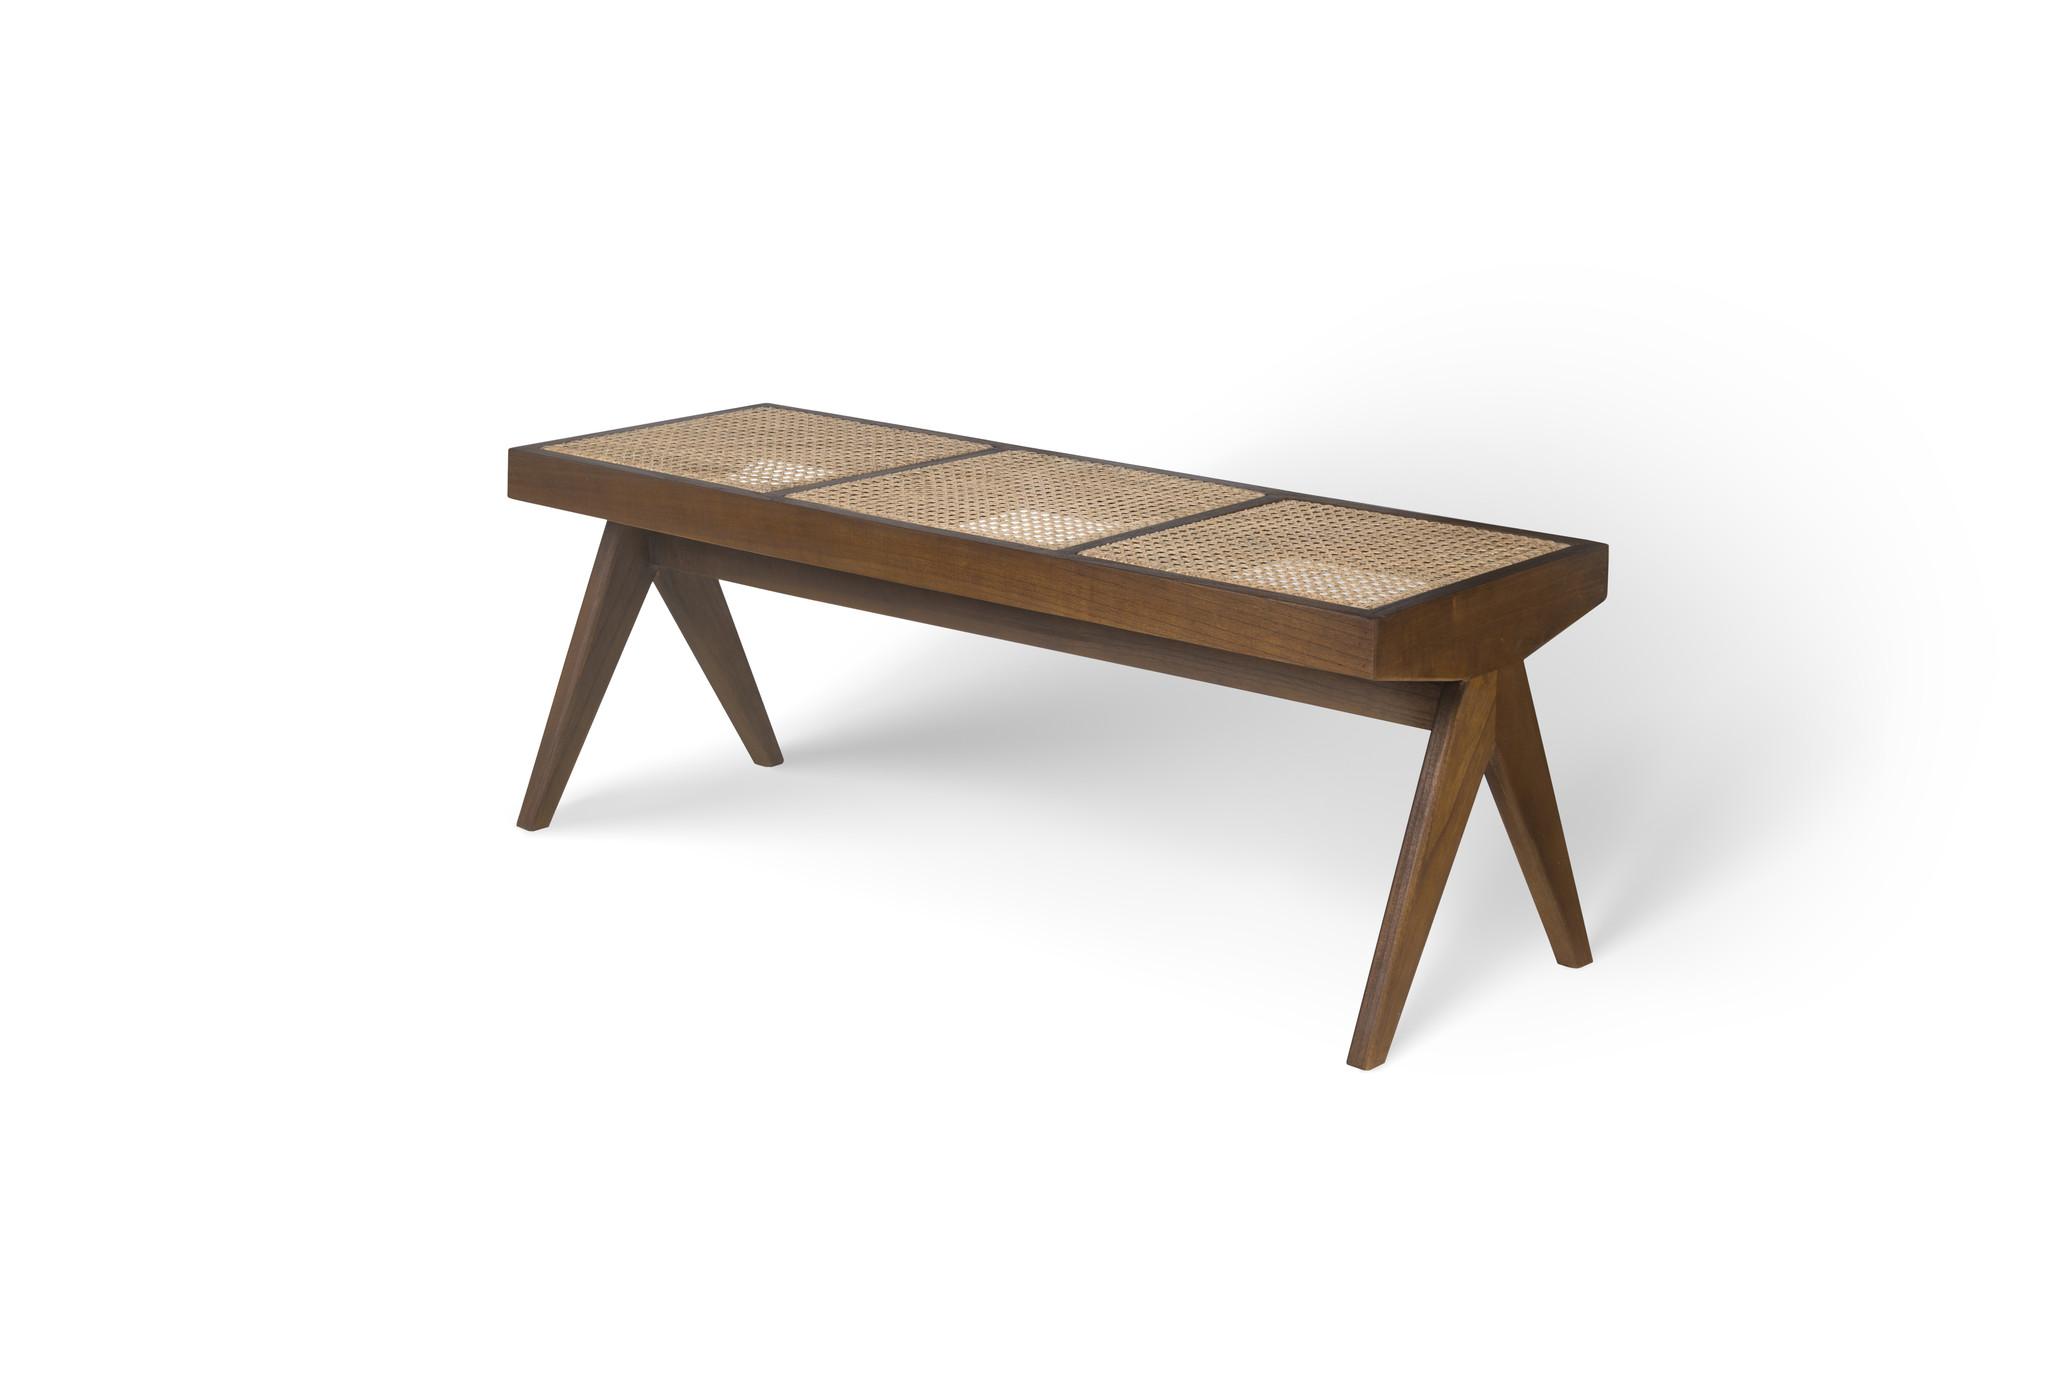 Bench / B.T.H. Flats 3-1